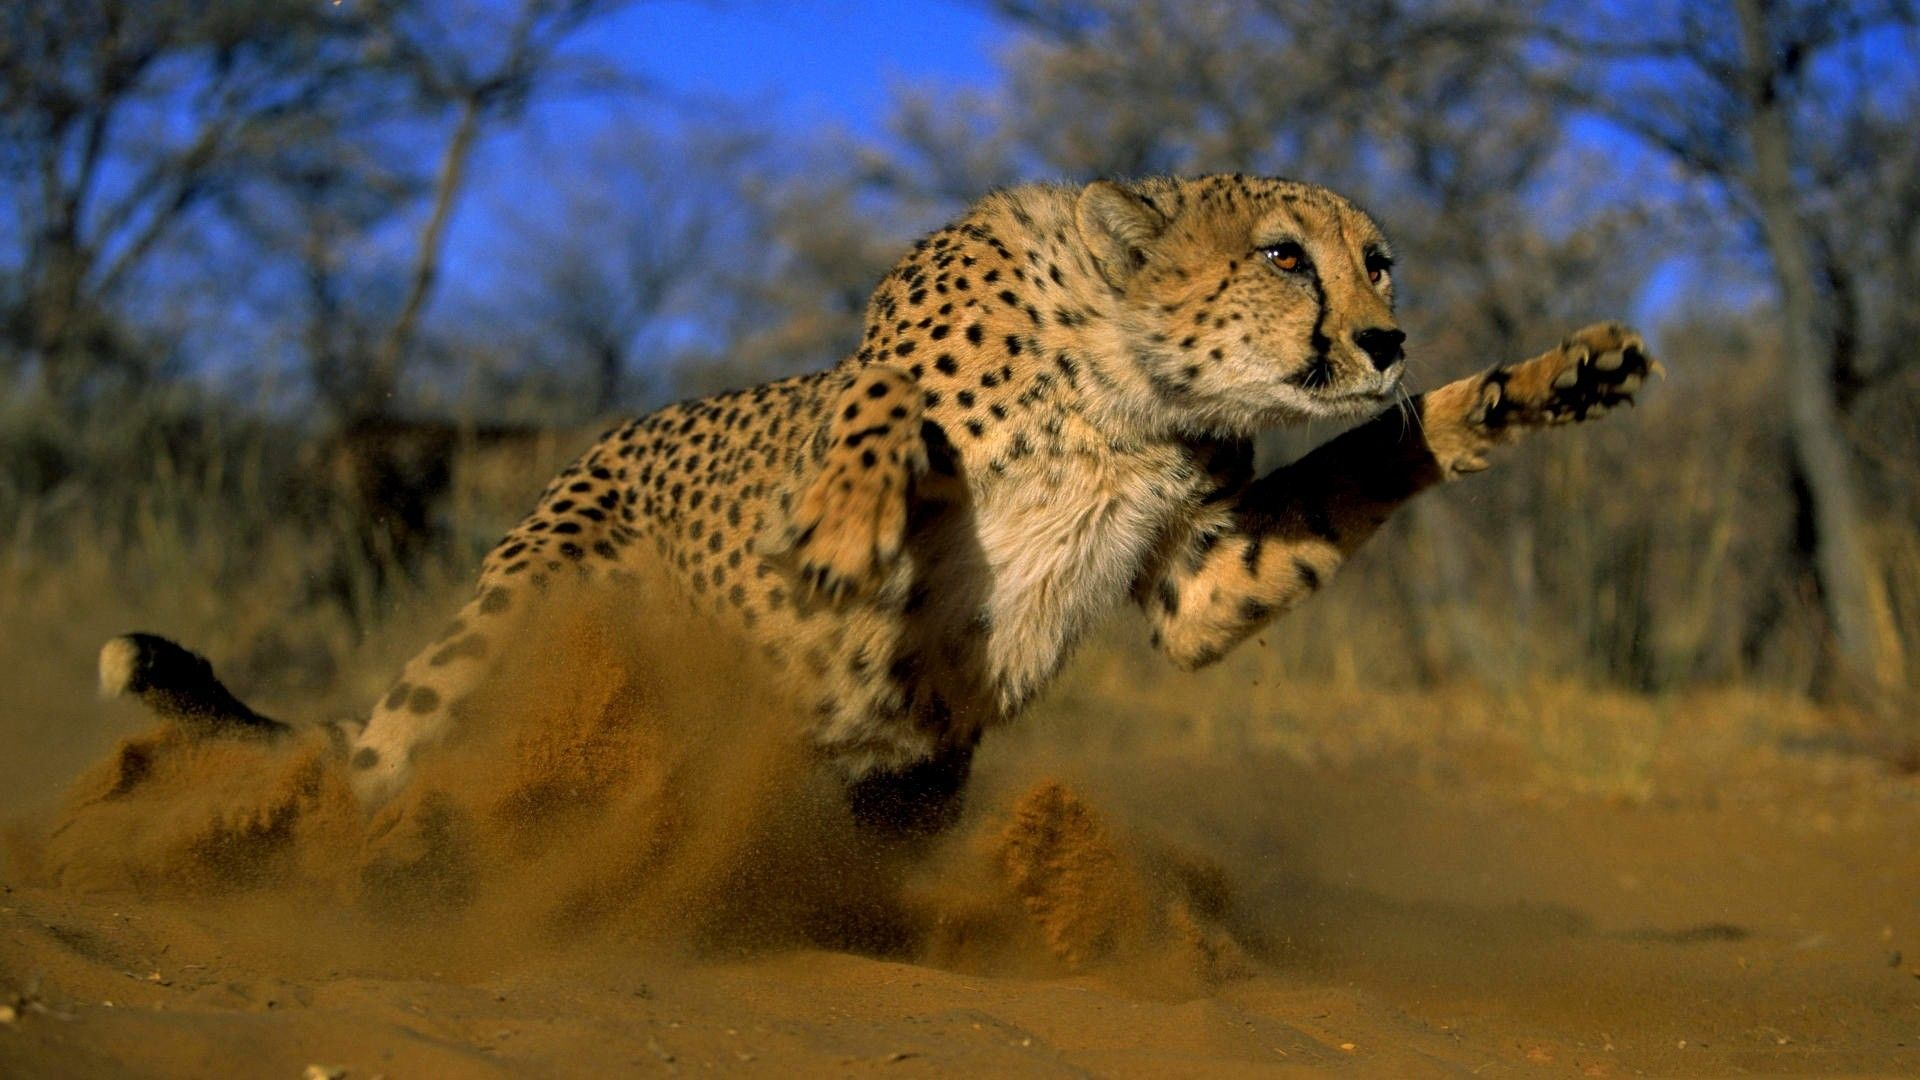 Running Cheetah Running Hd Wallpapers Smashing Hd Wallpapers Cheetah Wallpaper Animals Images Animals Beautiful